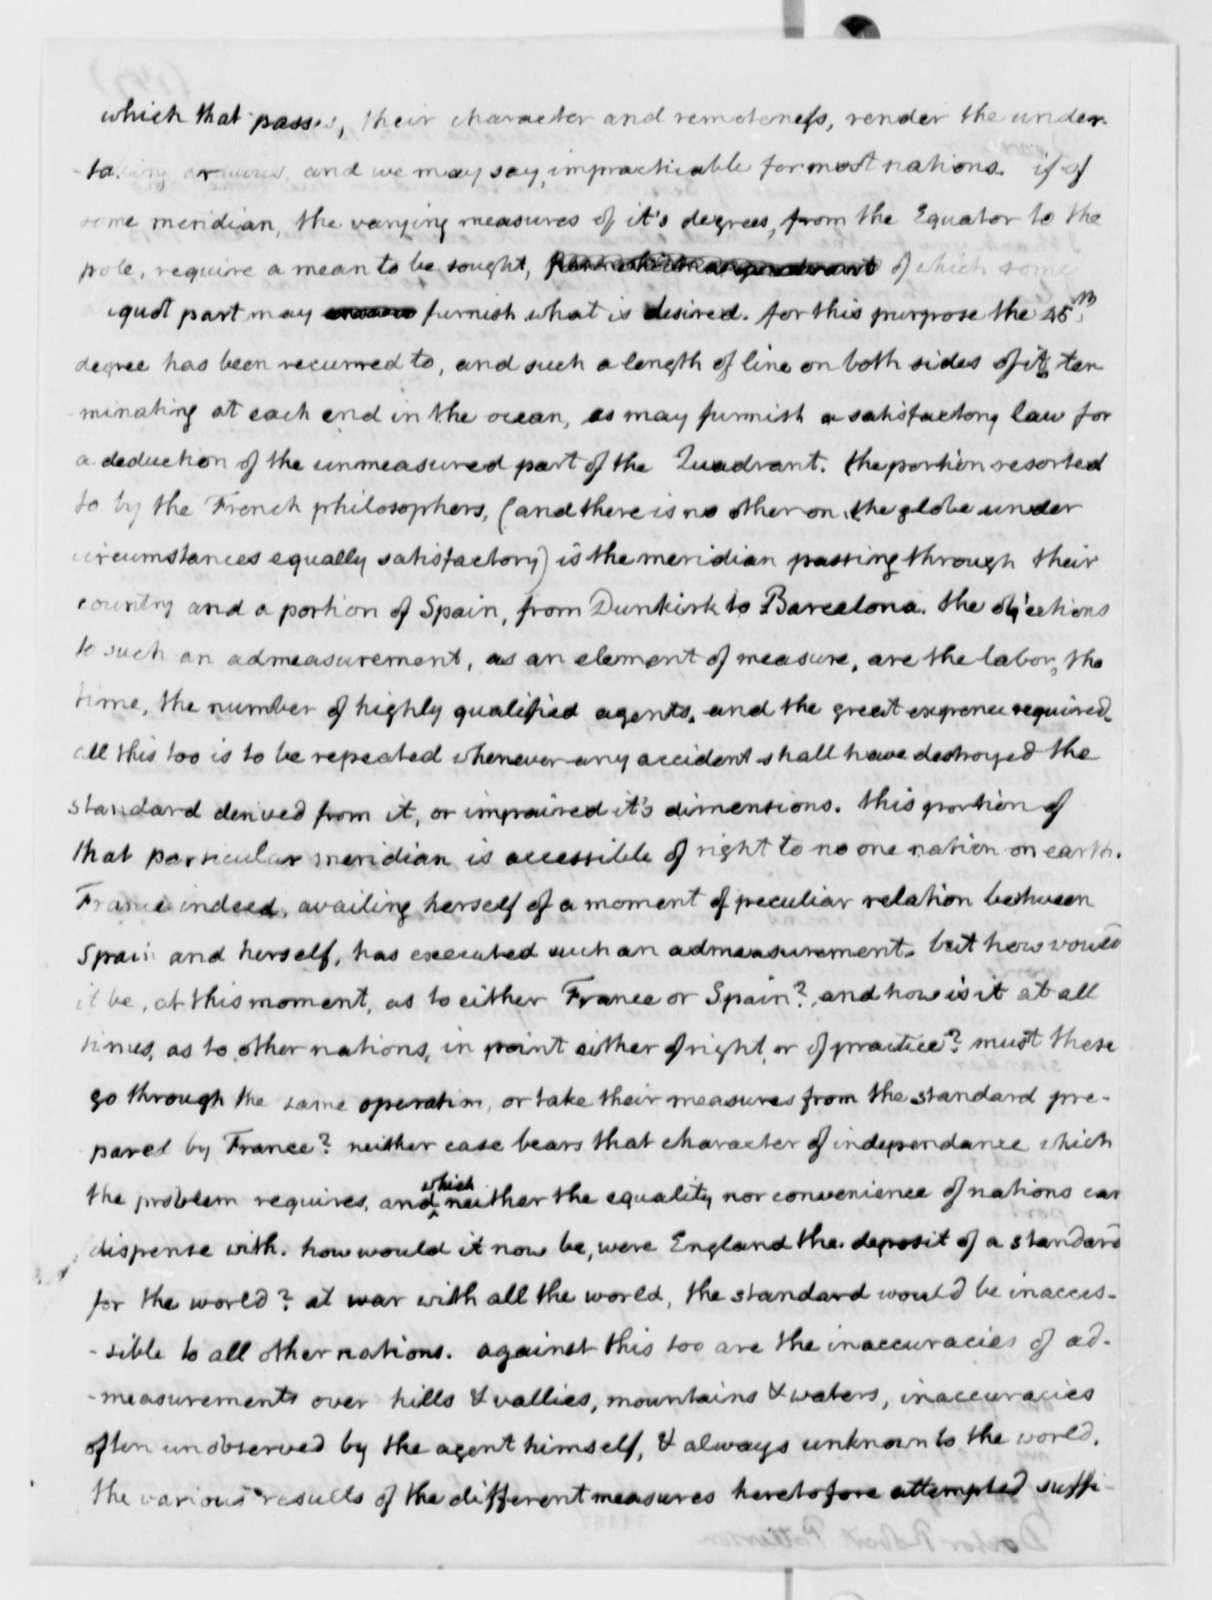 Thomas Jefferson to Robert Patterson, November 10, 1811